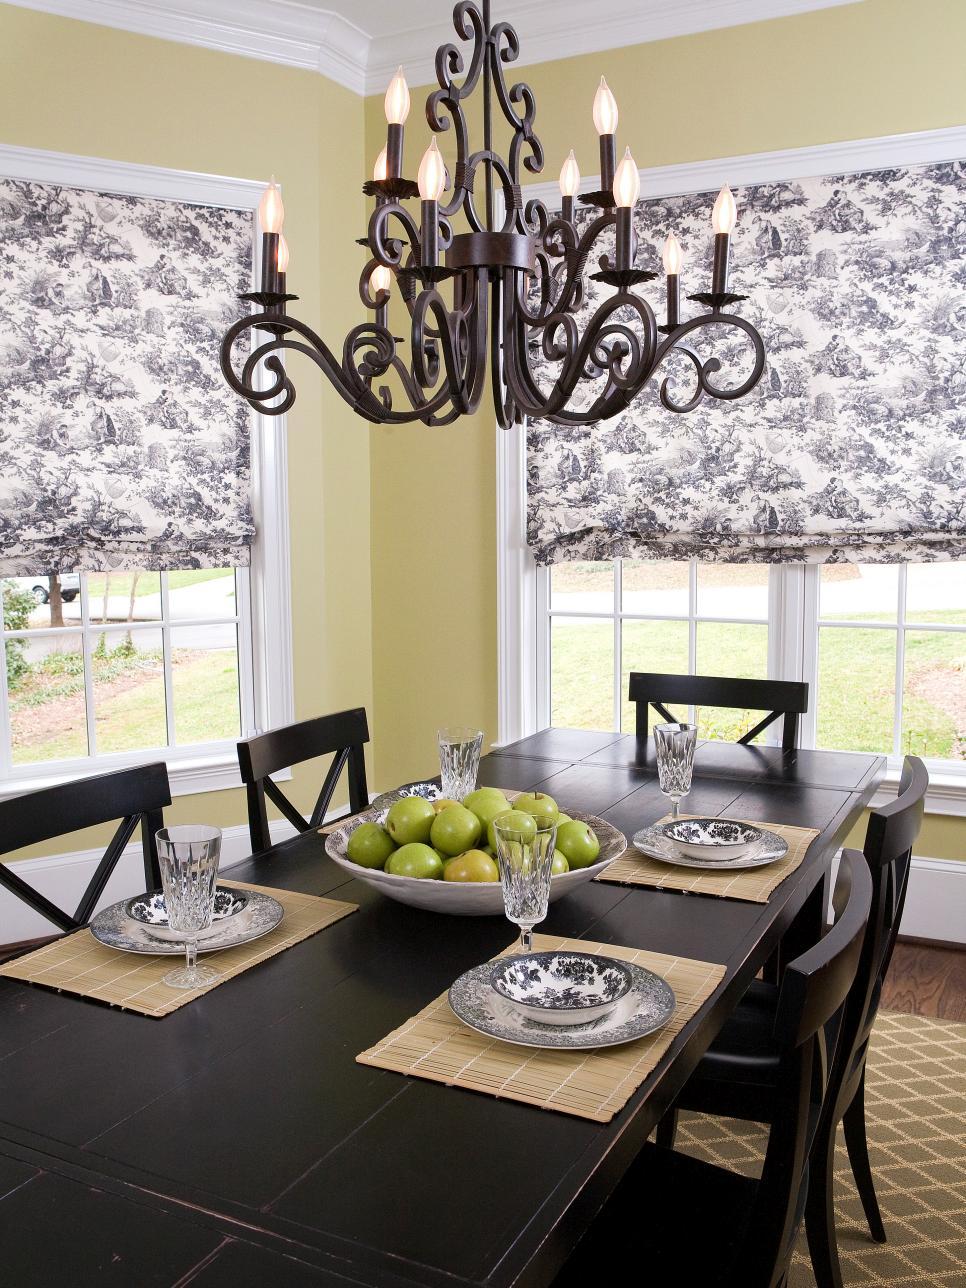 Creative Kitchen Window Treatments Hgtv Pictures Ideas: Search Viewer